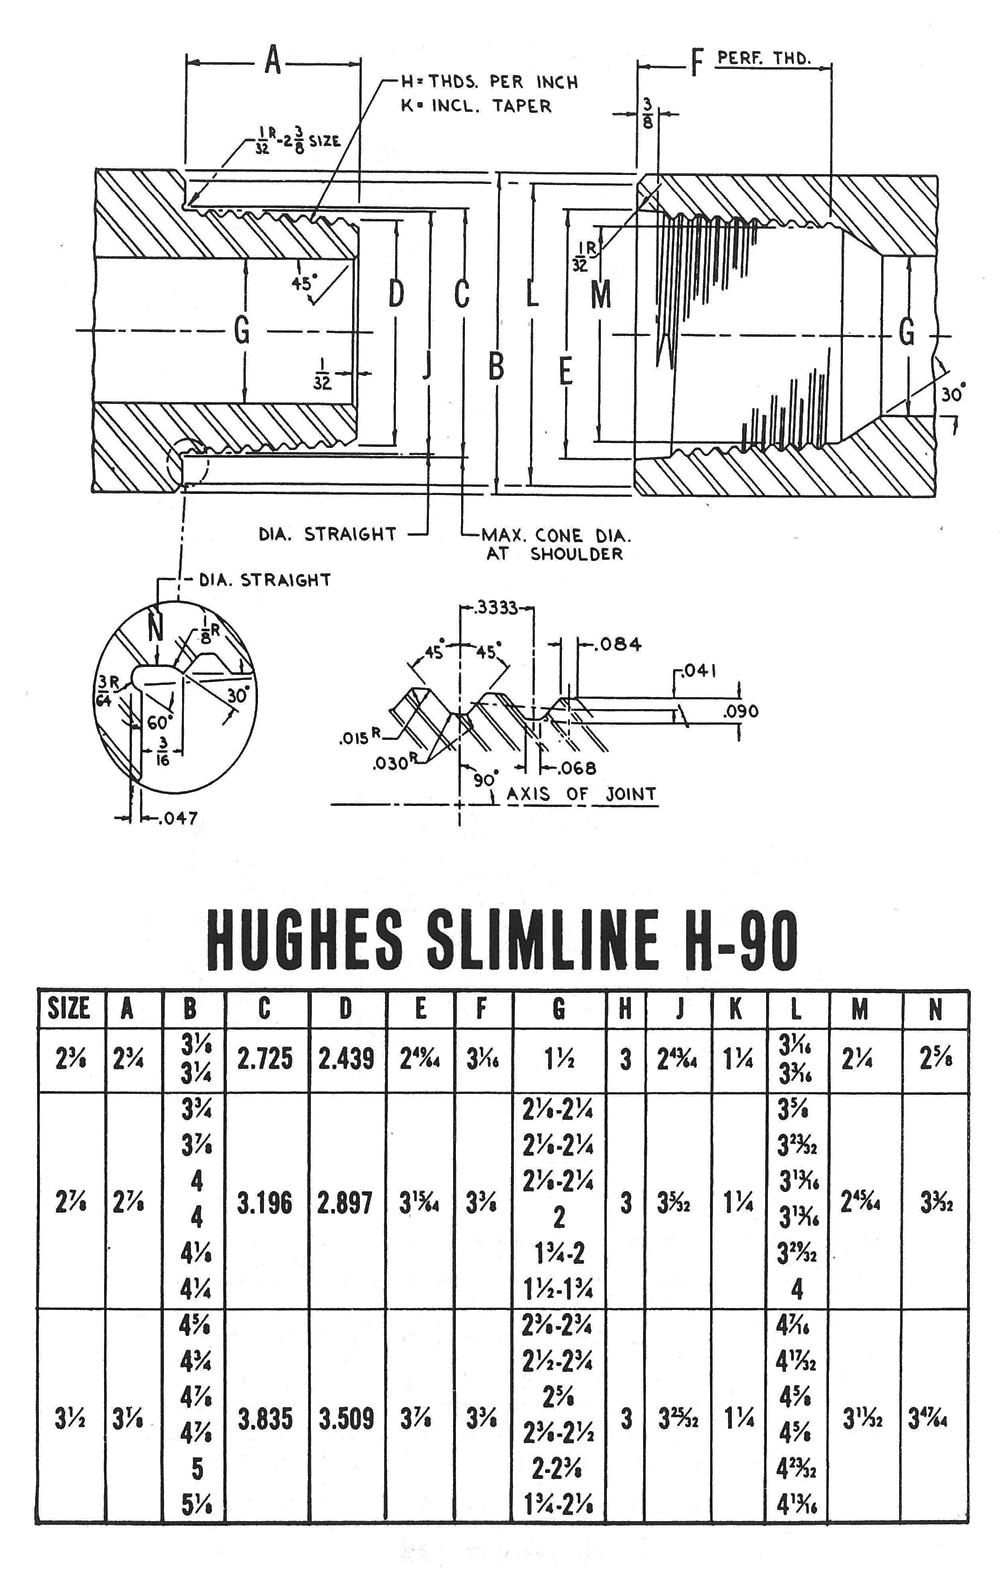 Hughes Slimline H-90